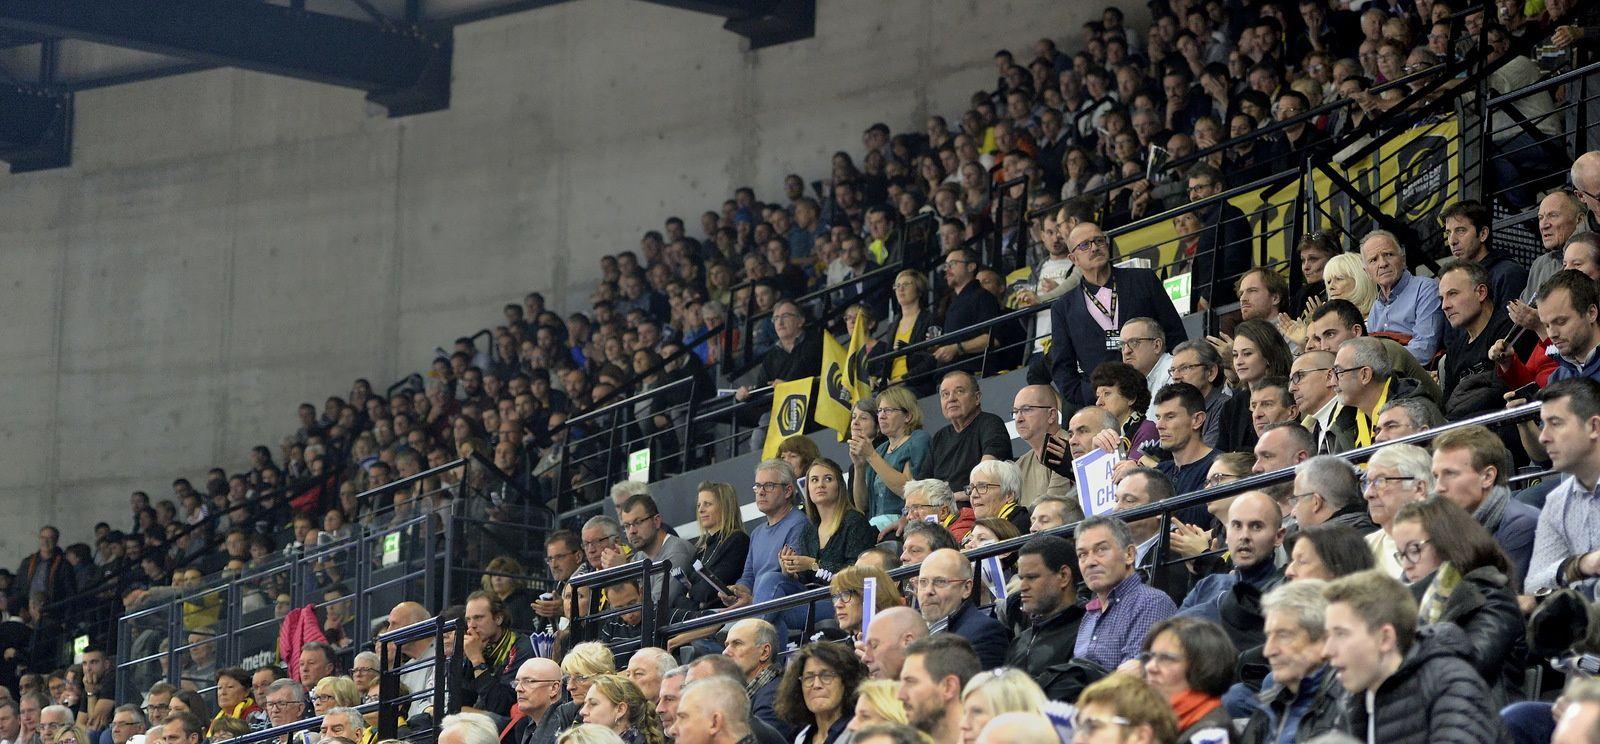 LSL CHAMBERY : 22 - MONTPELLIER : 29 les photos du match 29 novembre 2018